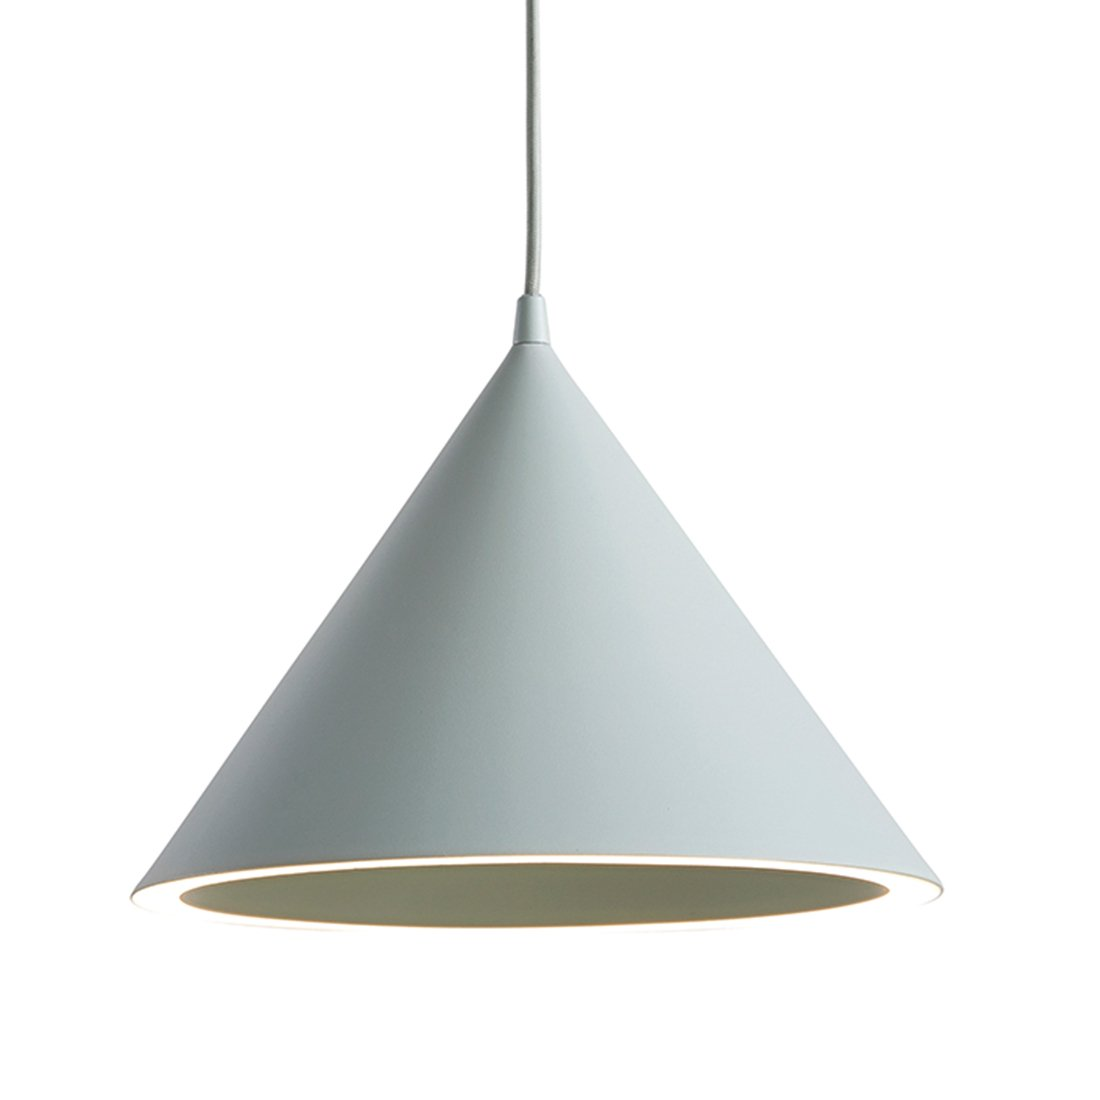 WOUD Annular Hanglamp Mintgroen